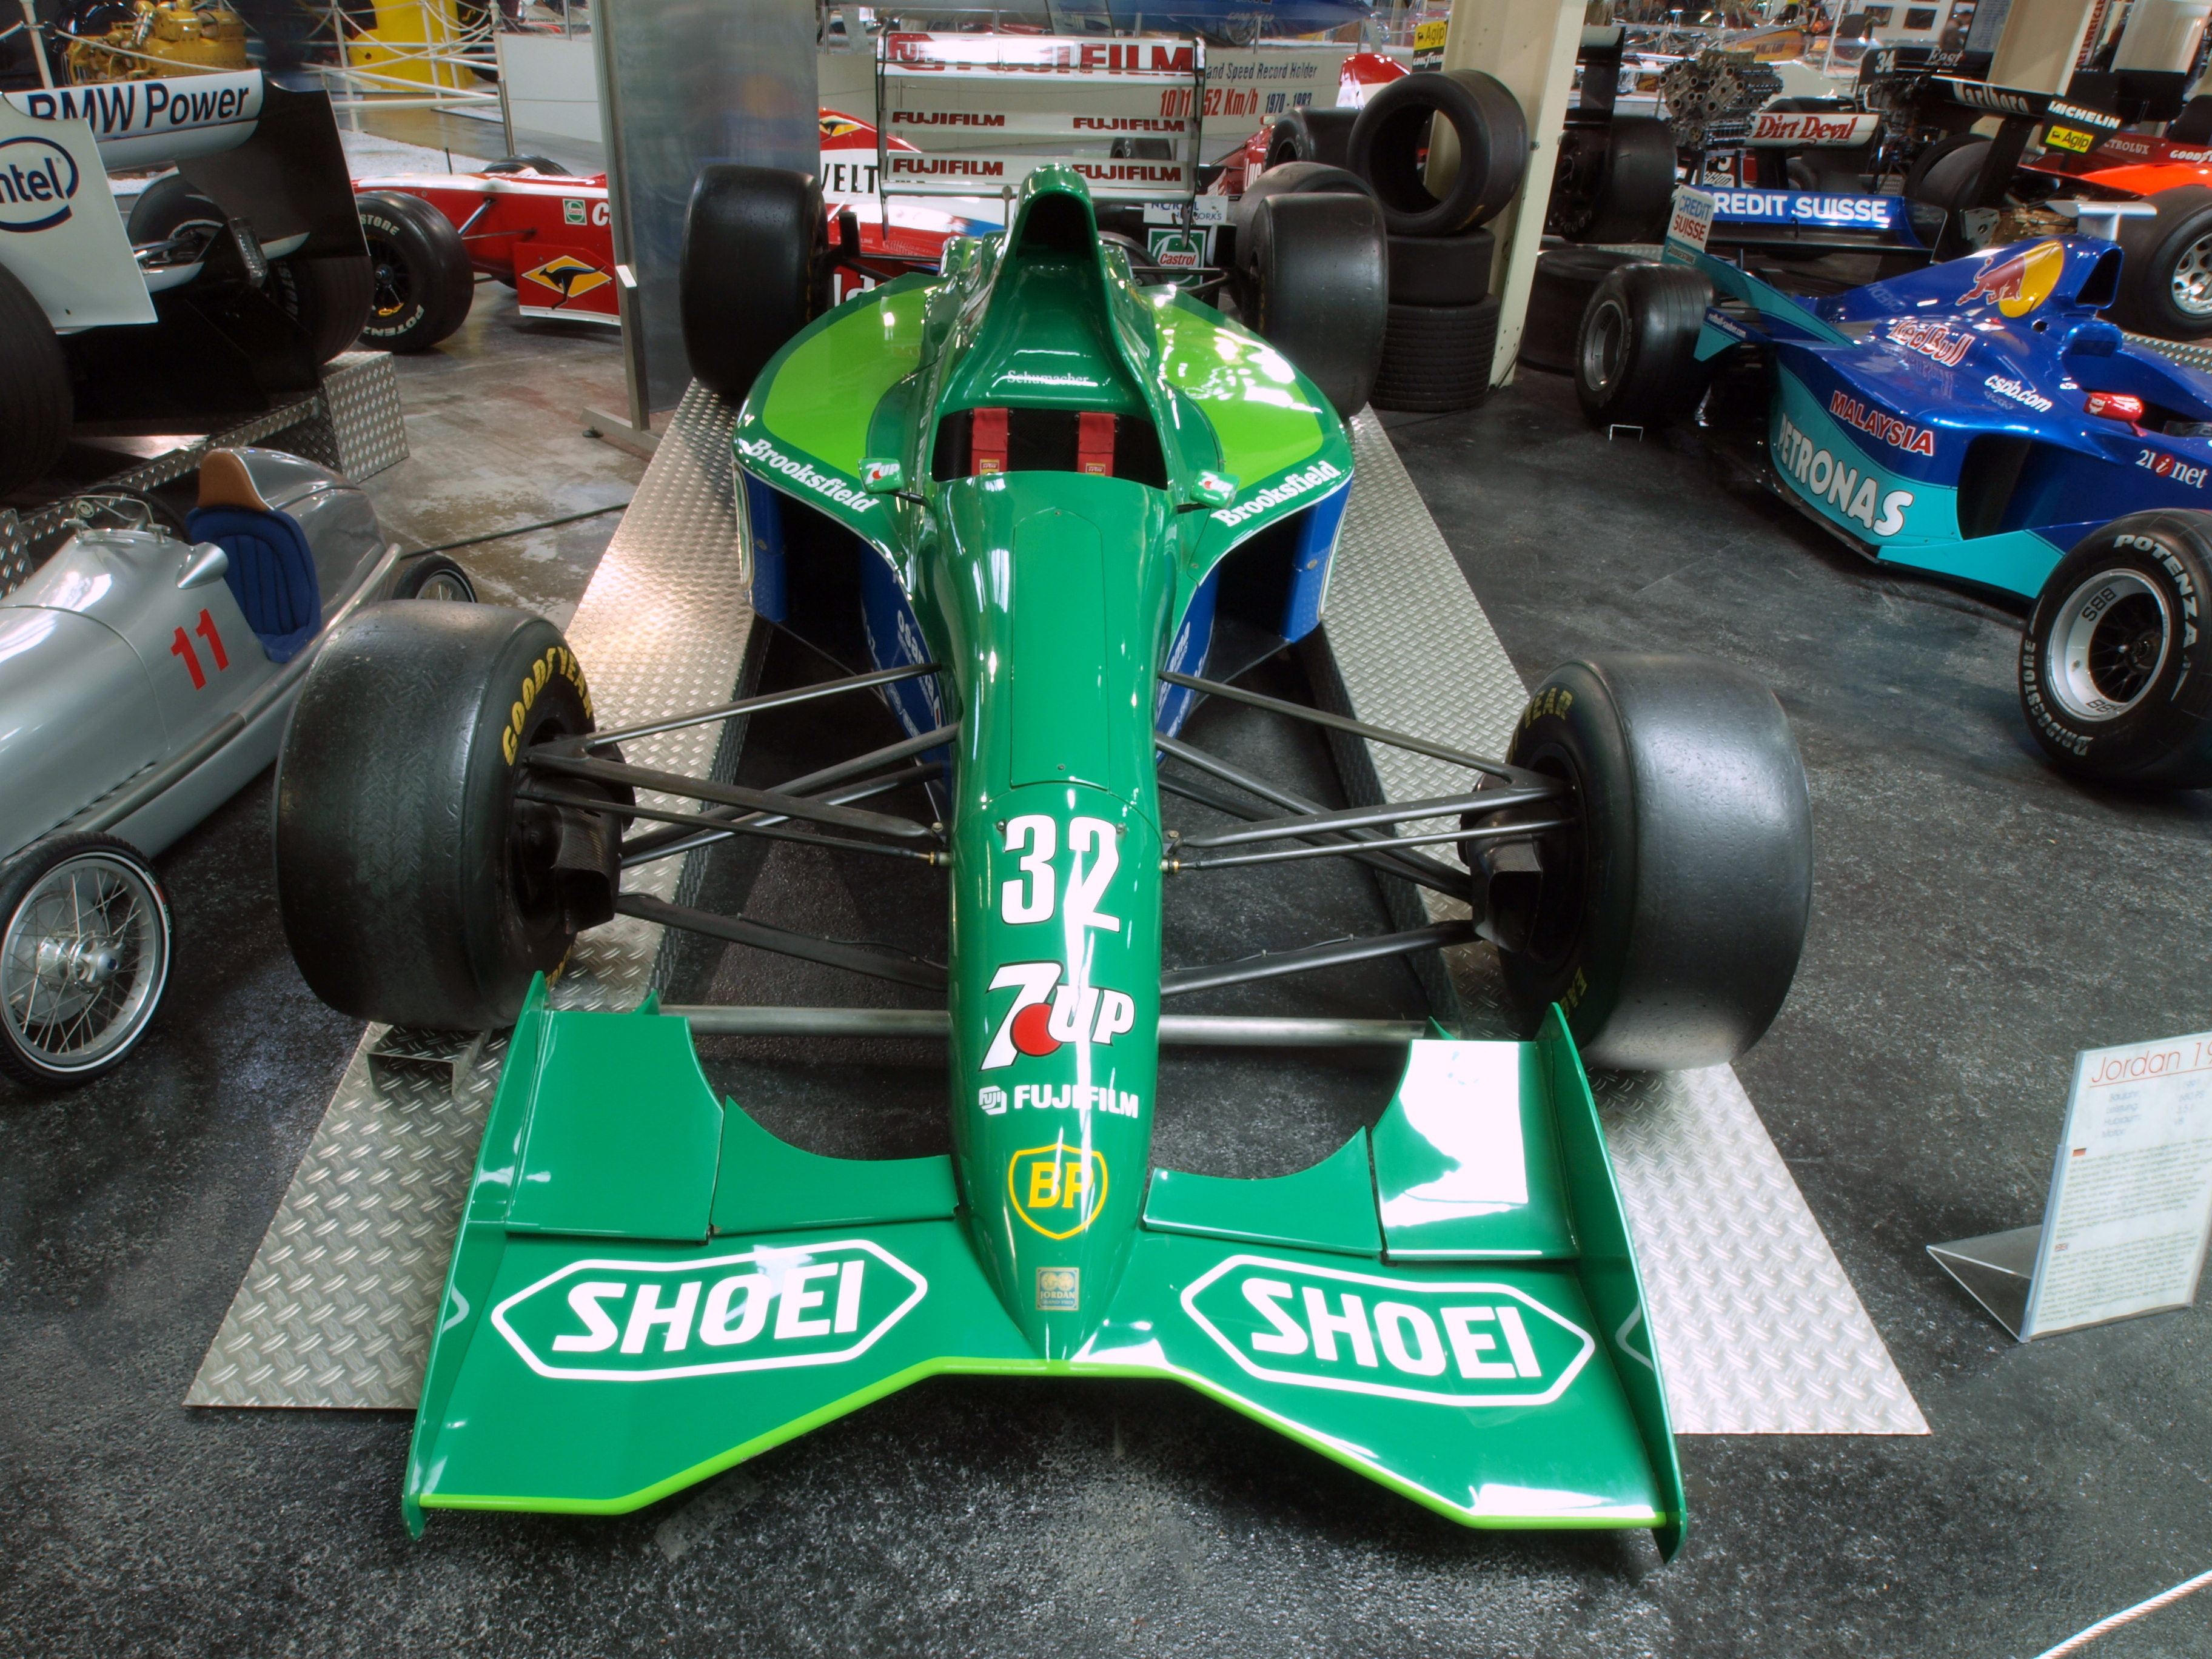 Rami Saidy Race Department Simulation Career Wiki Rock Paper Scissors Tournament Season 9 Racedepartment S Ultimate F1 Cars Page 2